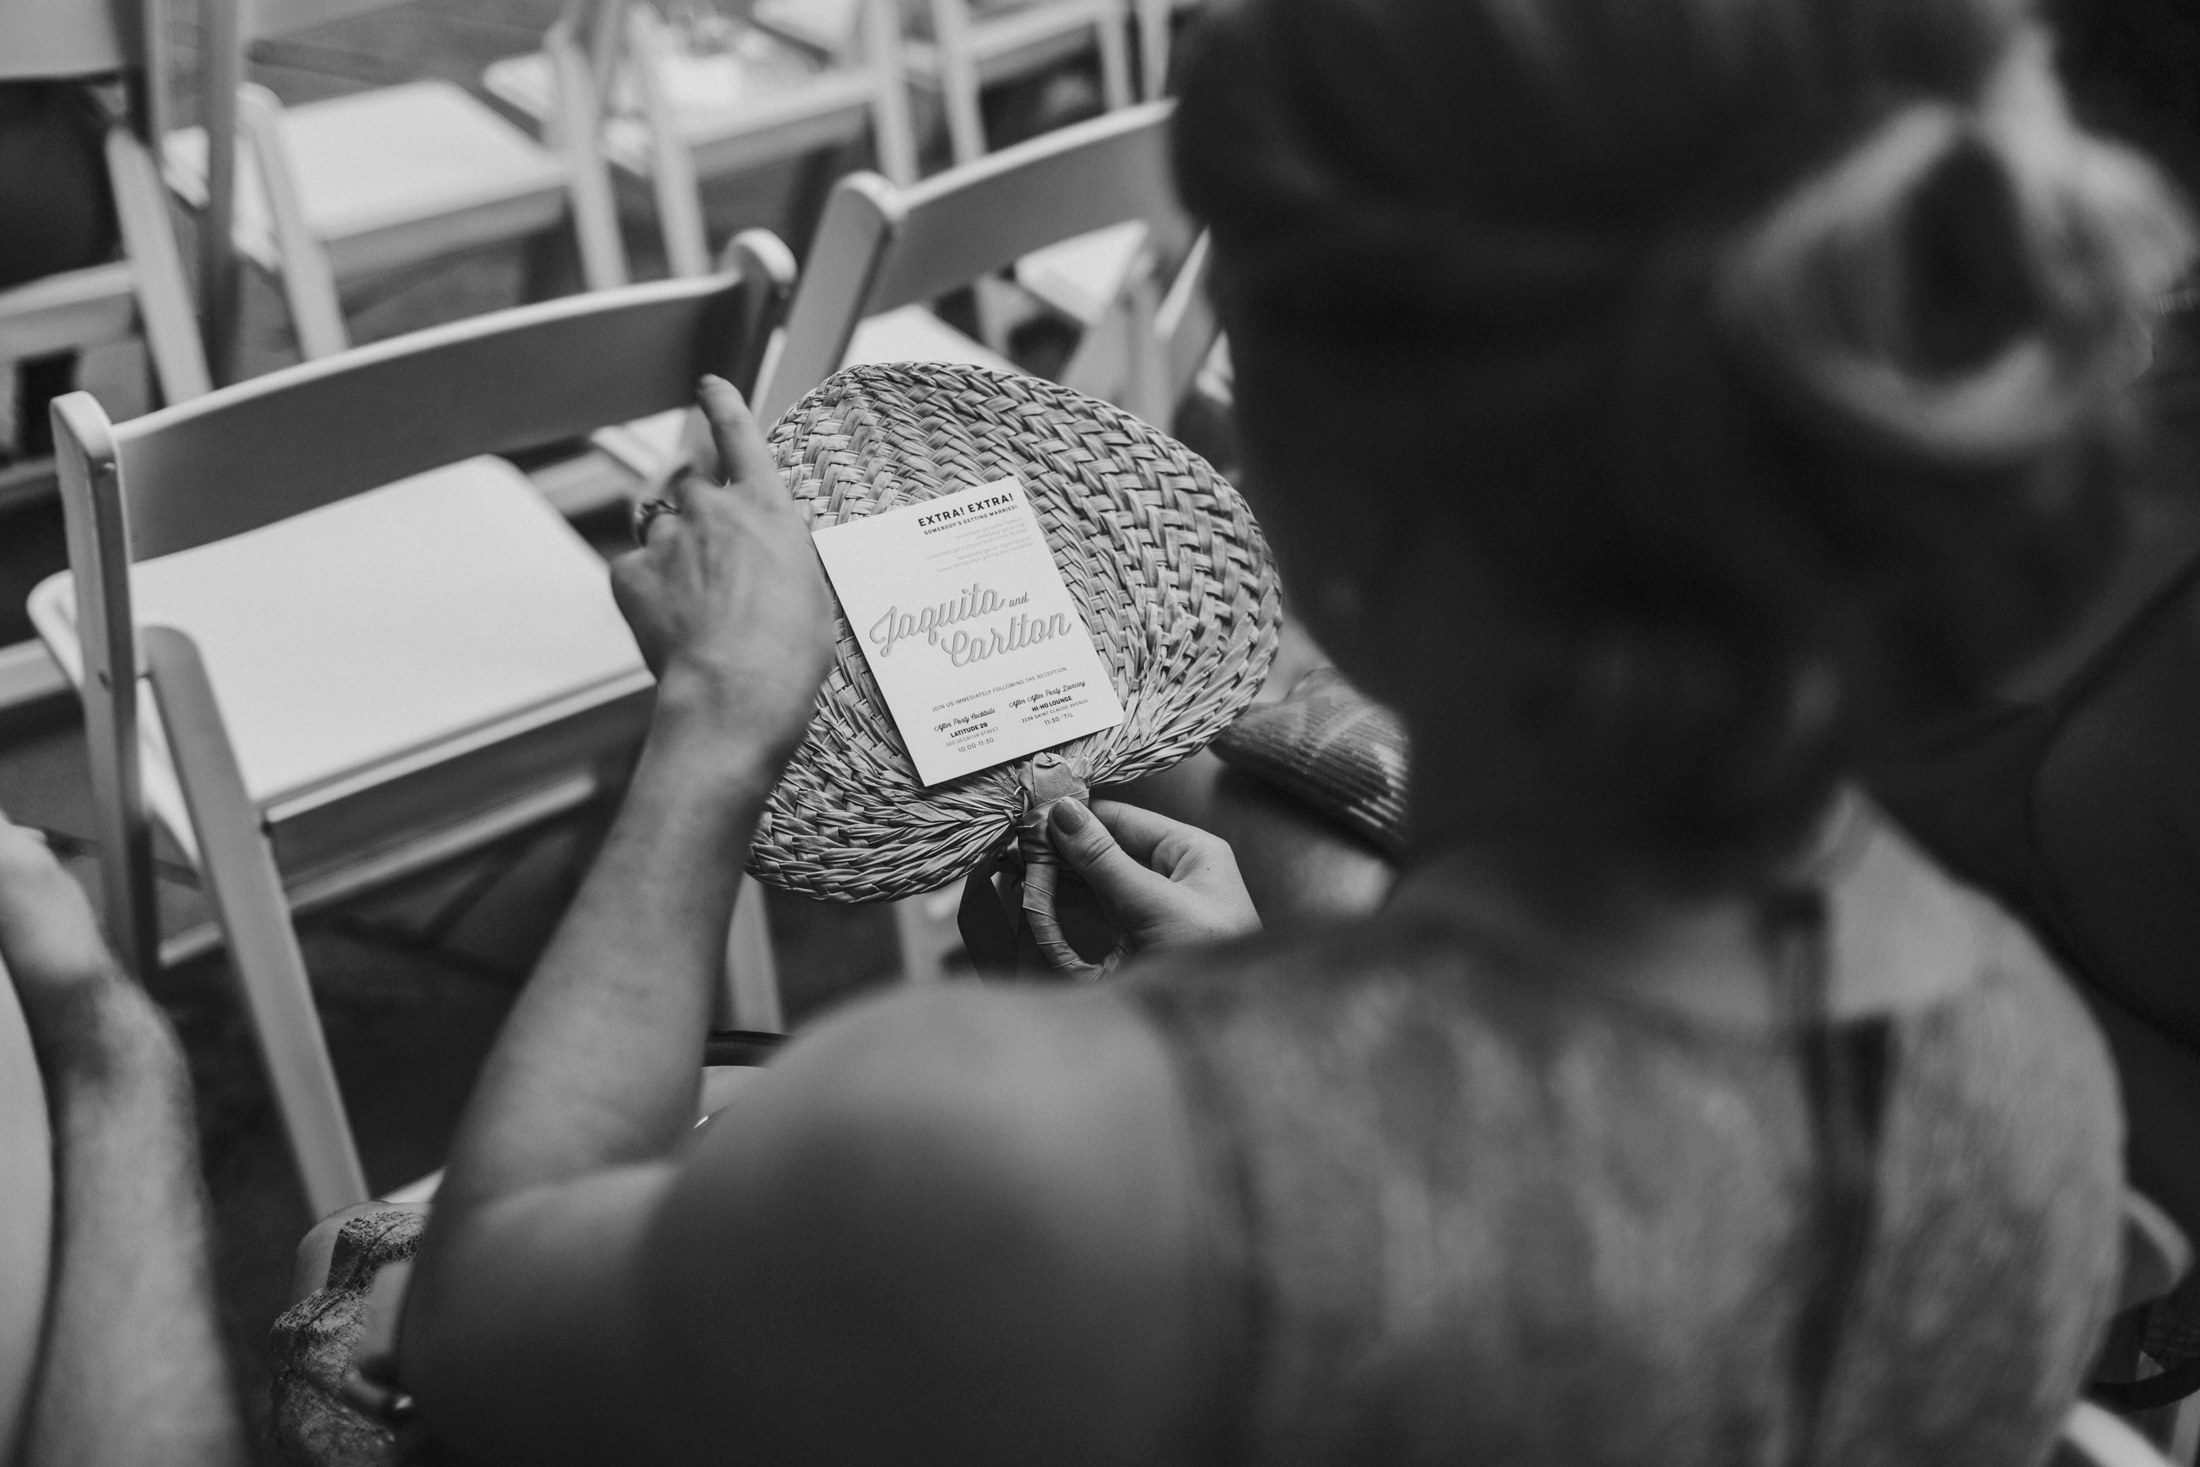 wedding guest holding raffia fan with attached program